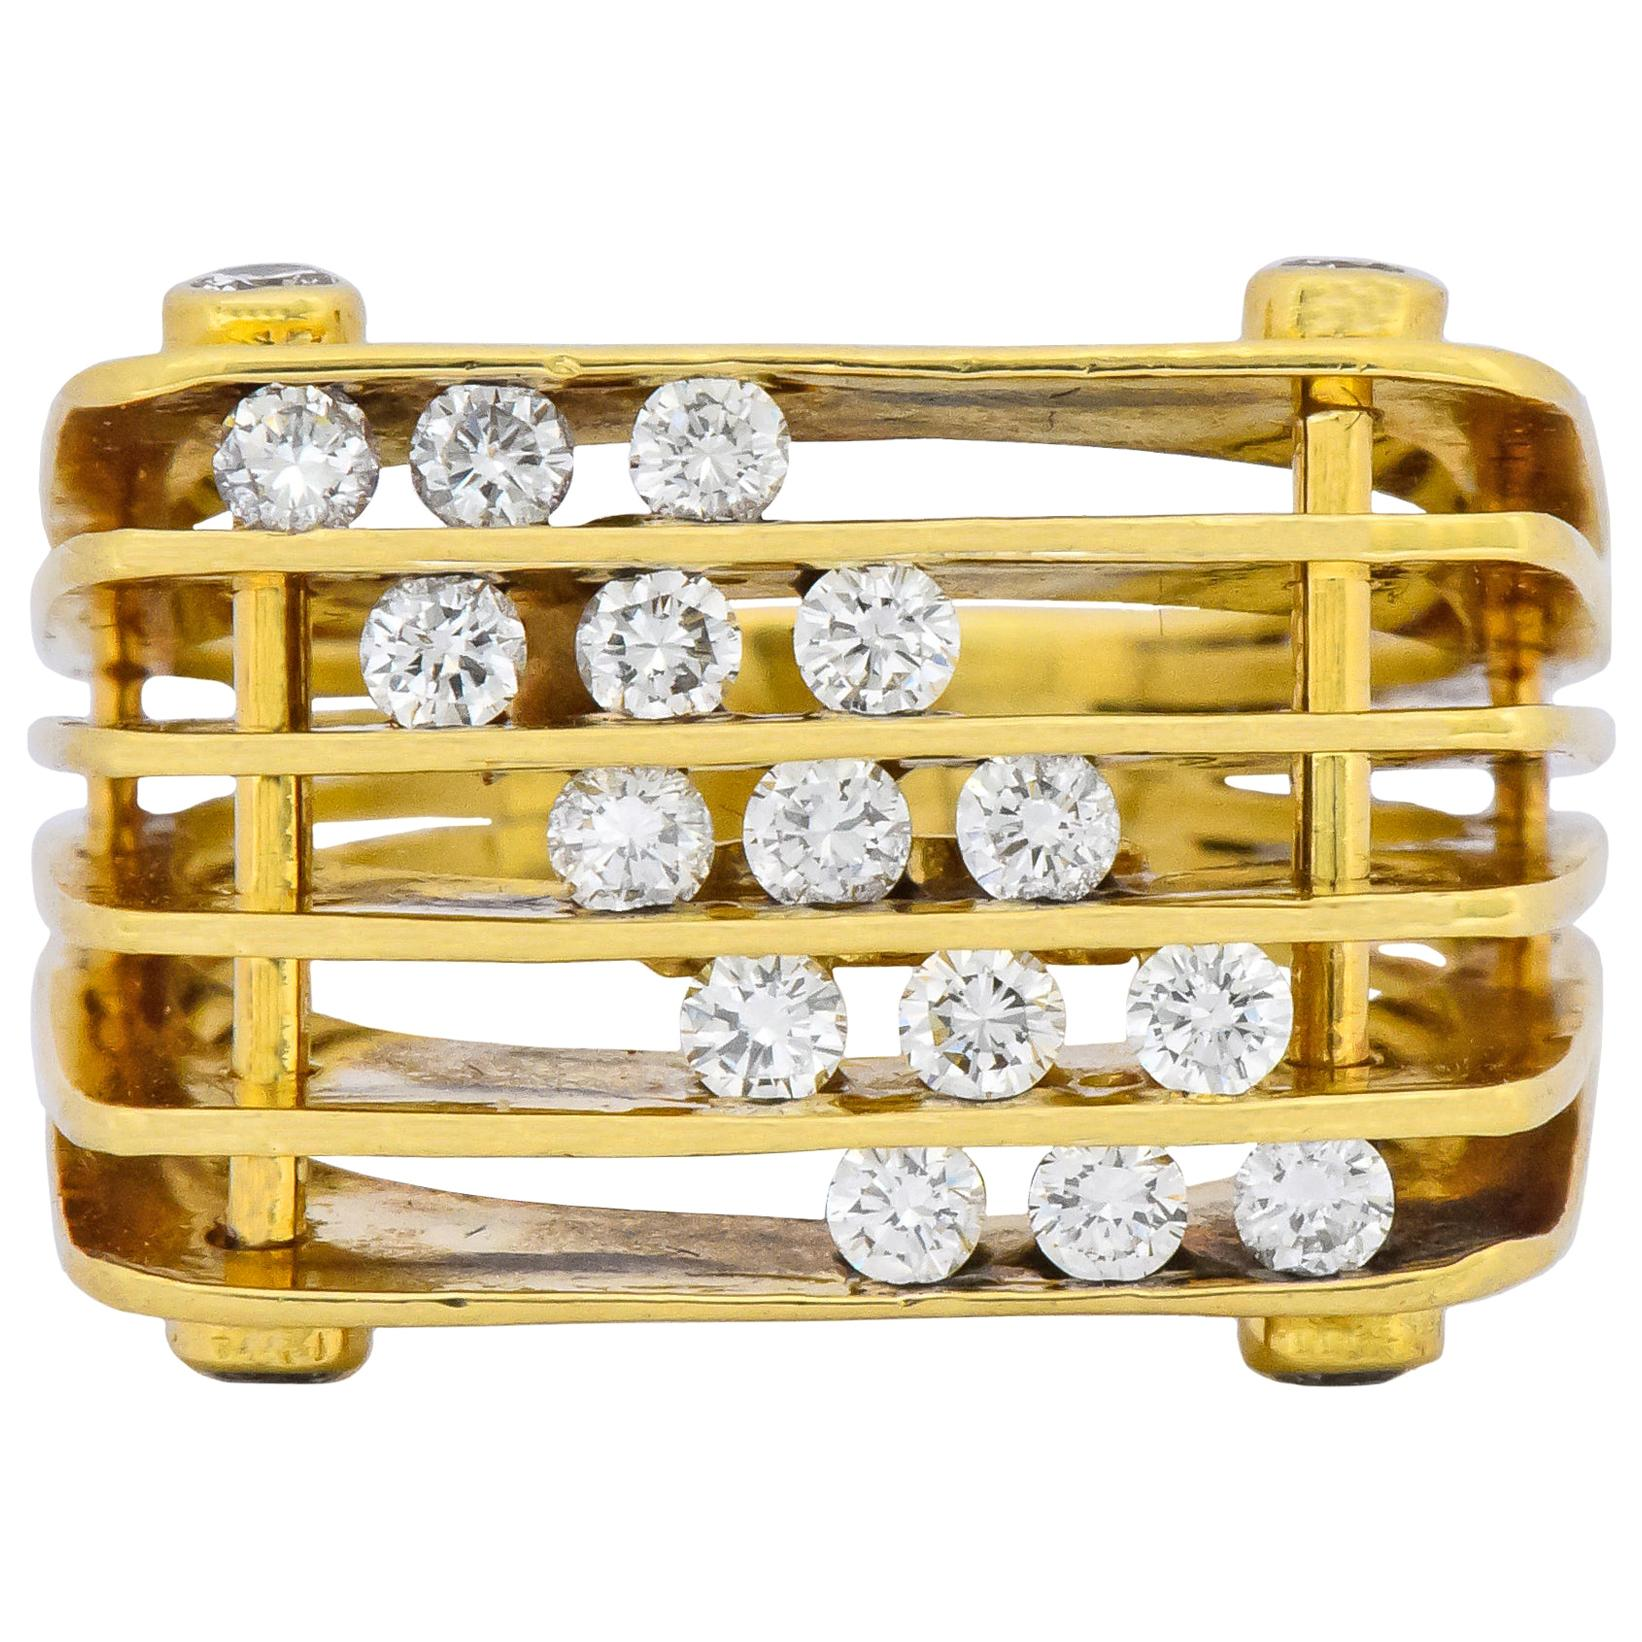 Jose Hess Modernist 0.87 Carat Diamond 18 Karat Gold Ring